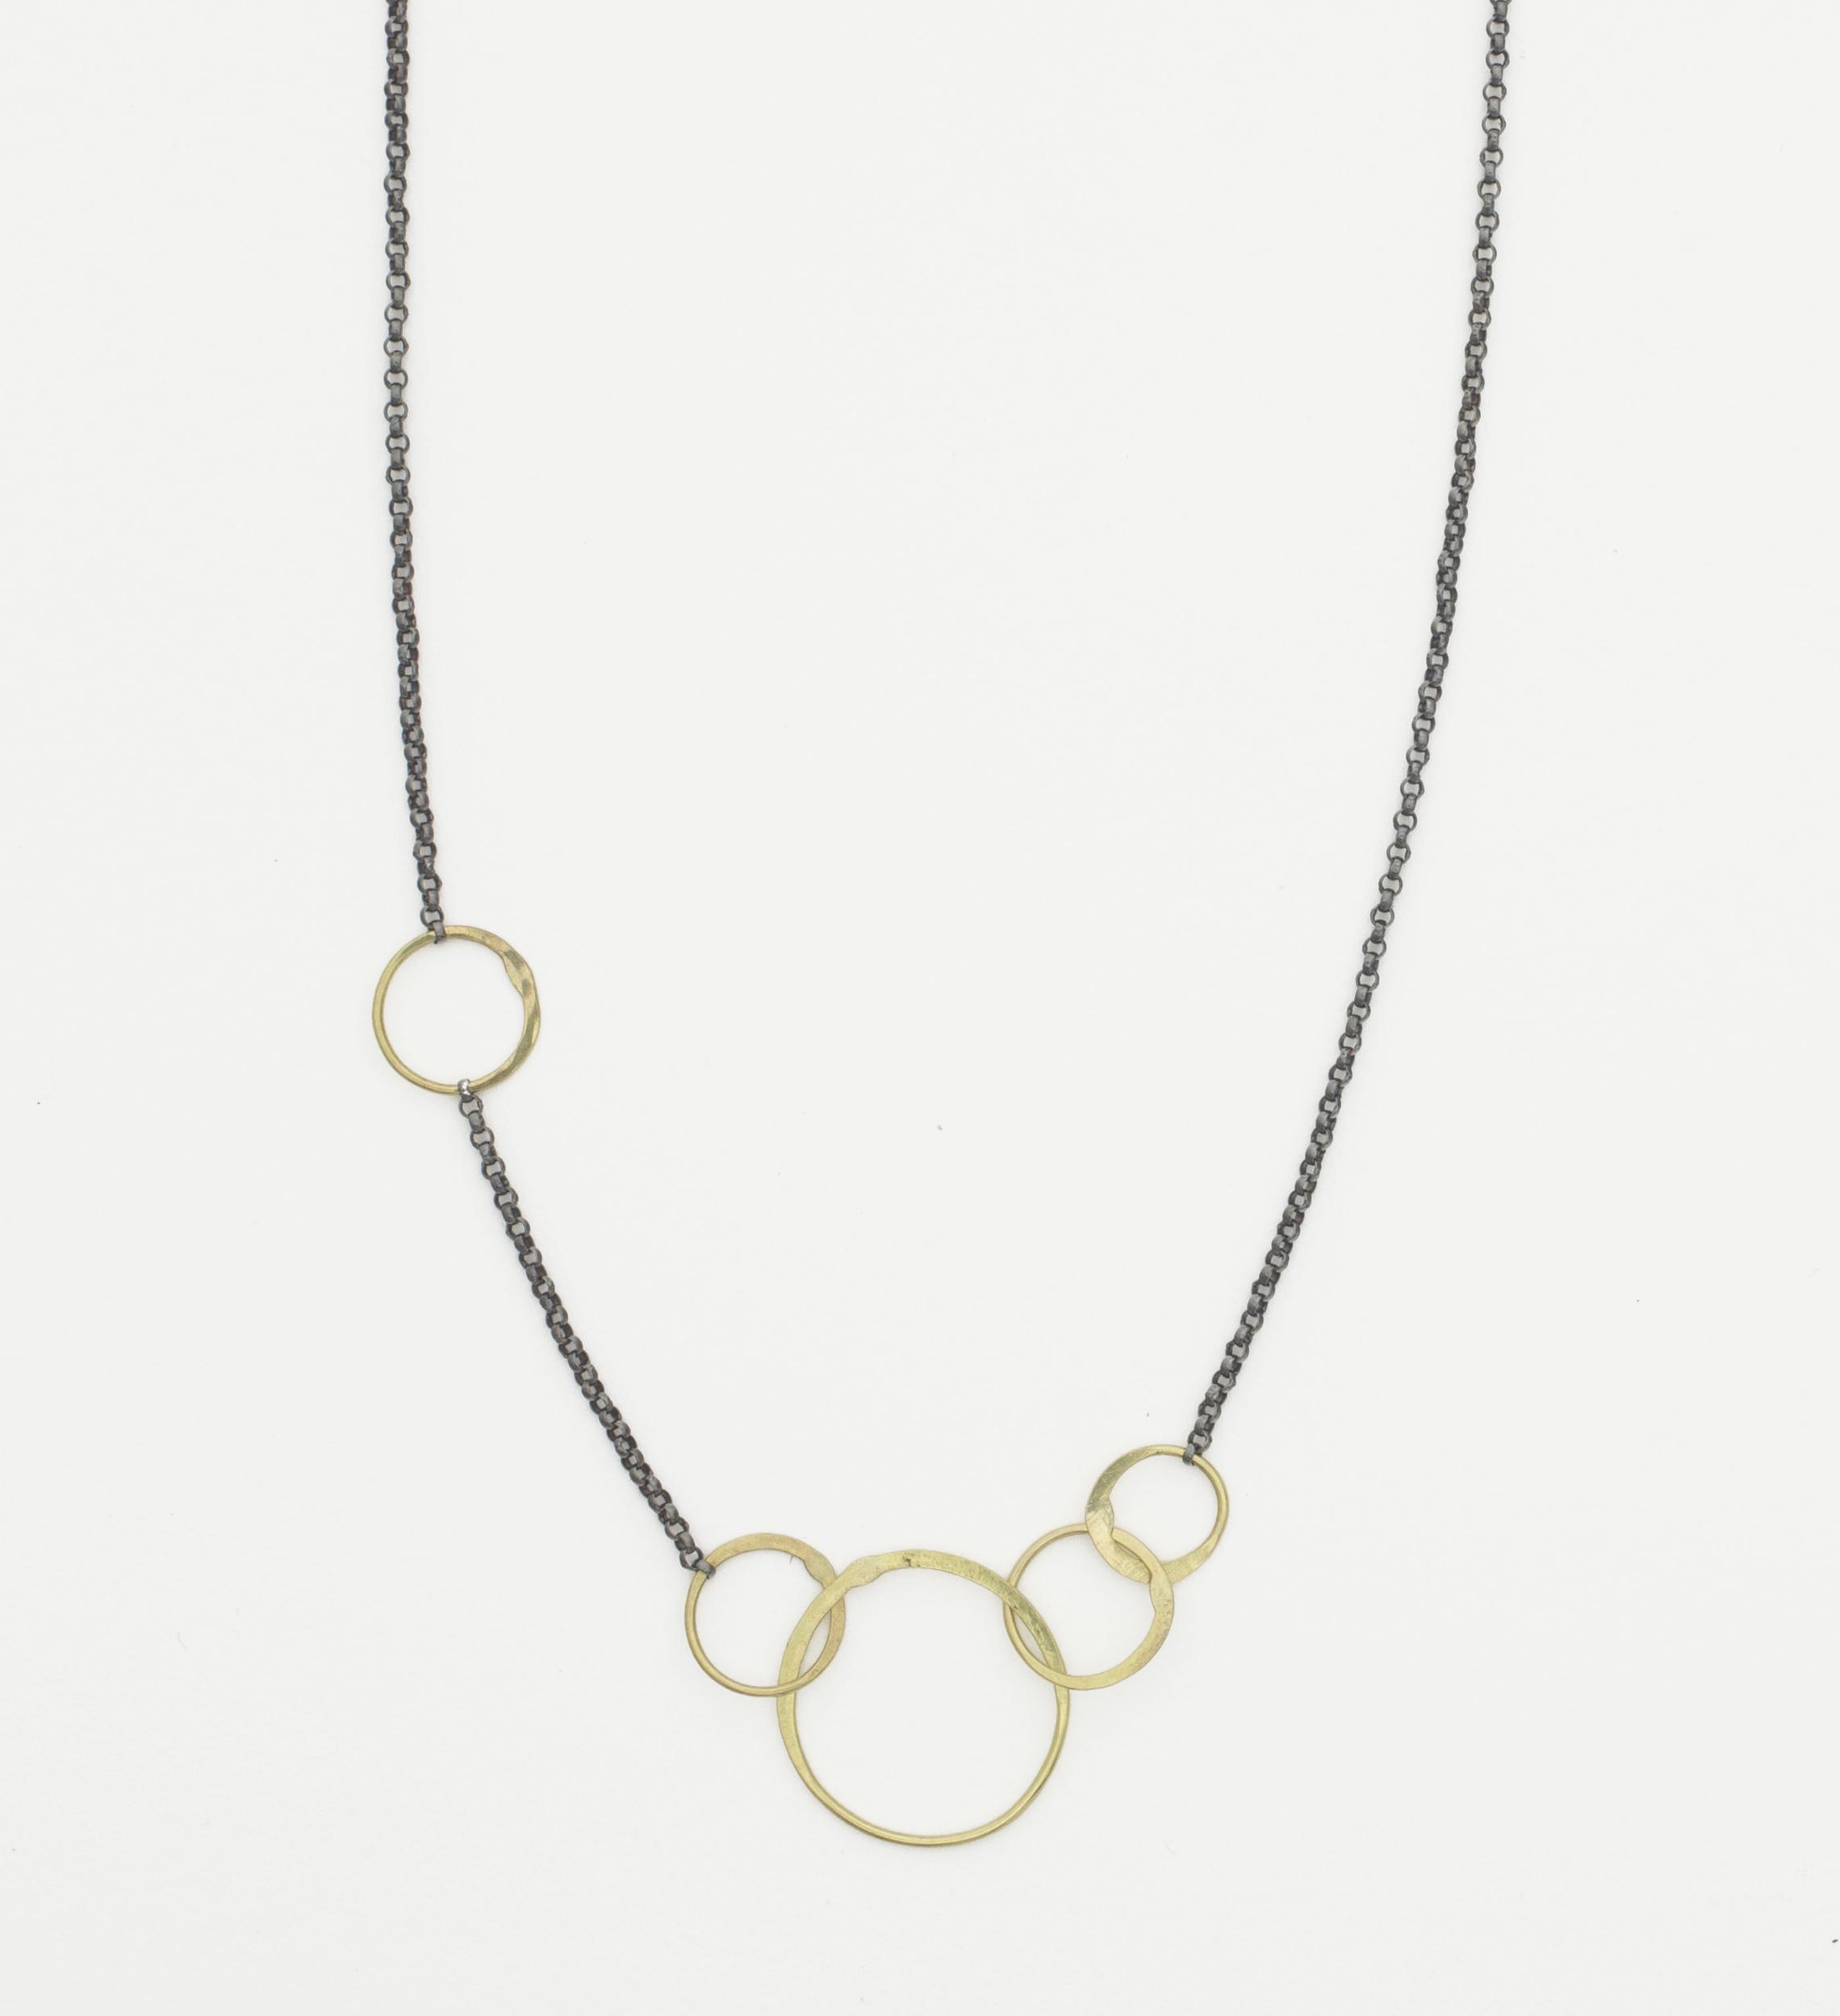 gold circles on chain.jpg